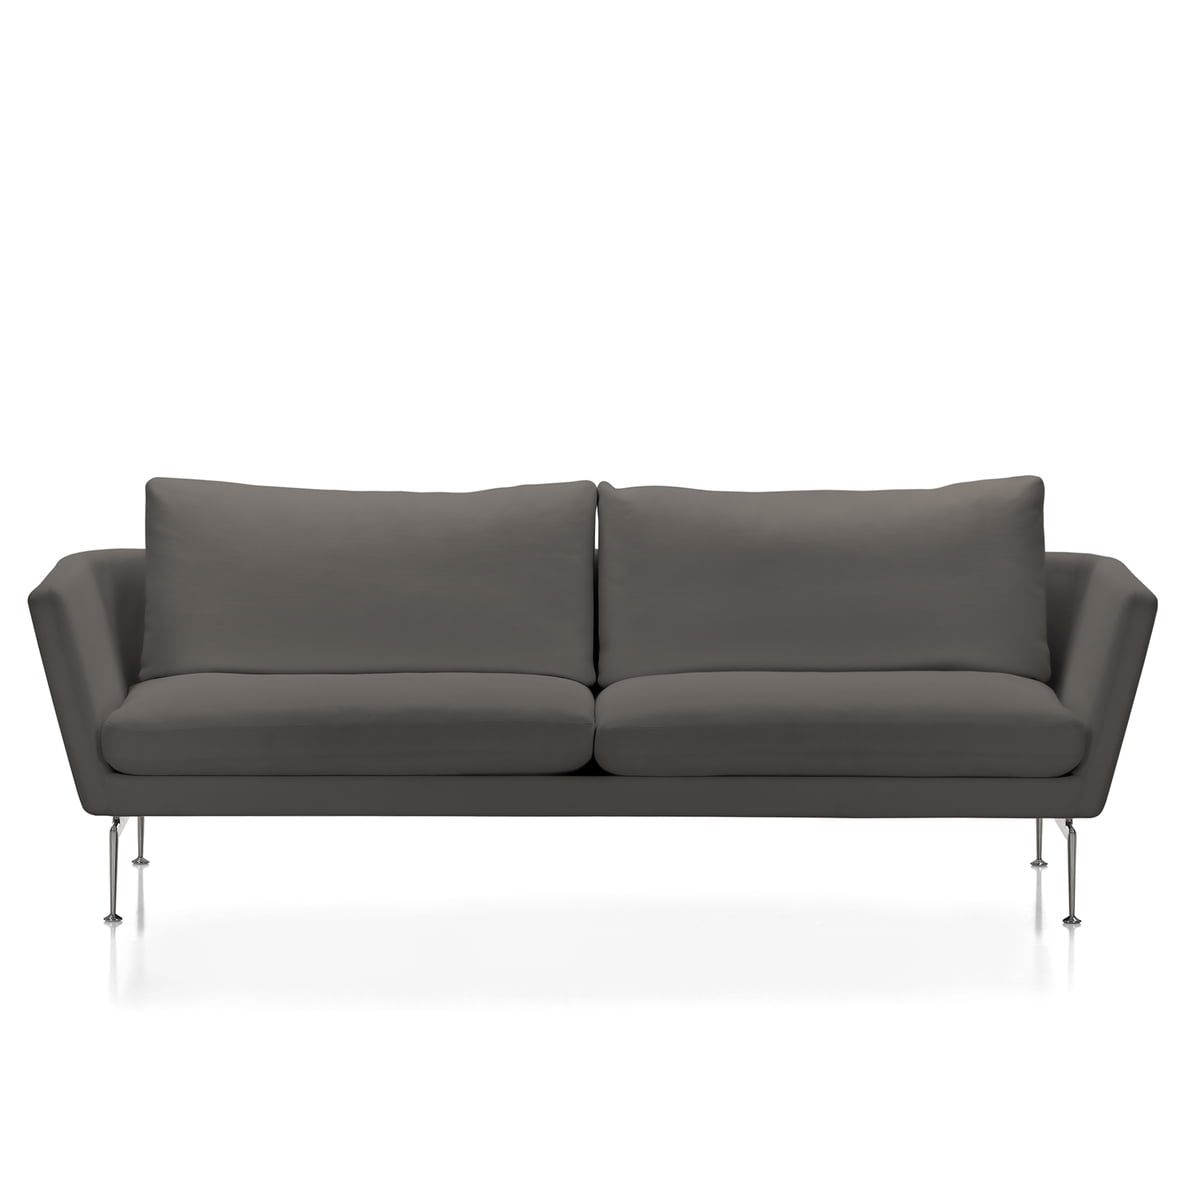 suita sofa von vitra. Black Bedroom Furniture Sets. Home Design Ideas